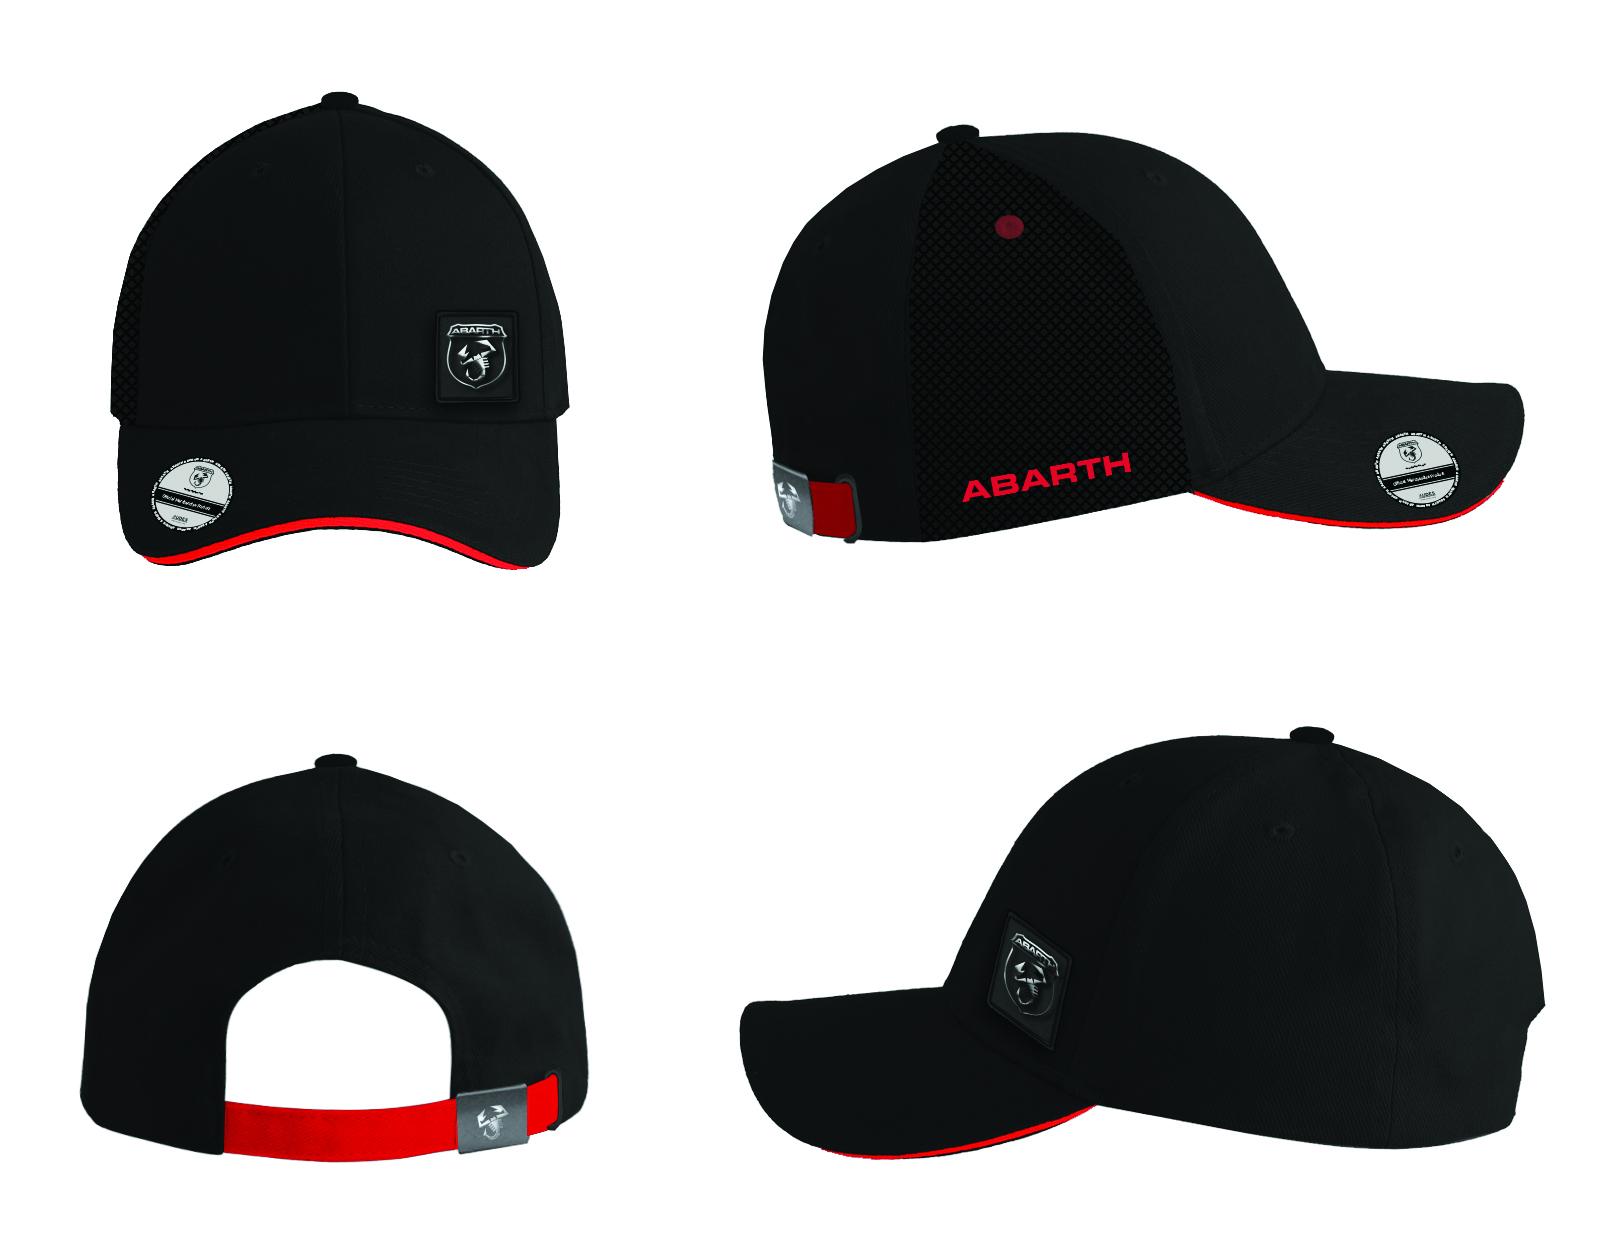 New! 2021 Fiat Abarth Corse Mens Black Logo Baseball Cap Official Merchandise